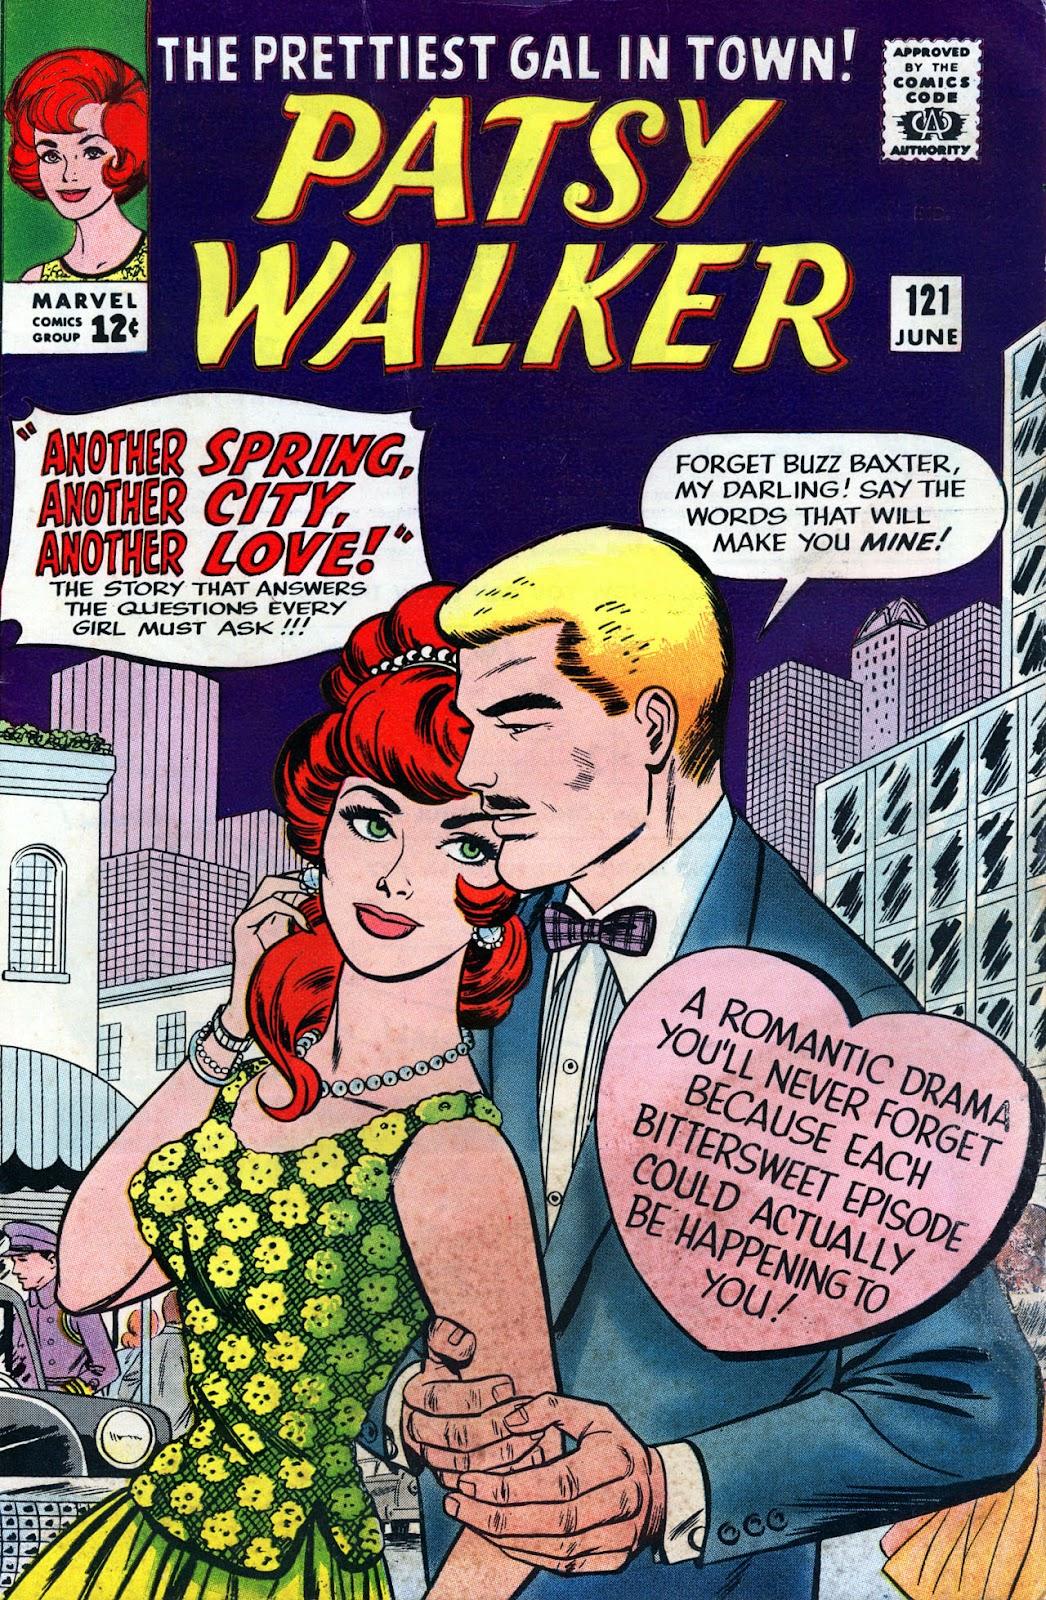 Patsy Walker 121 Page 1